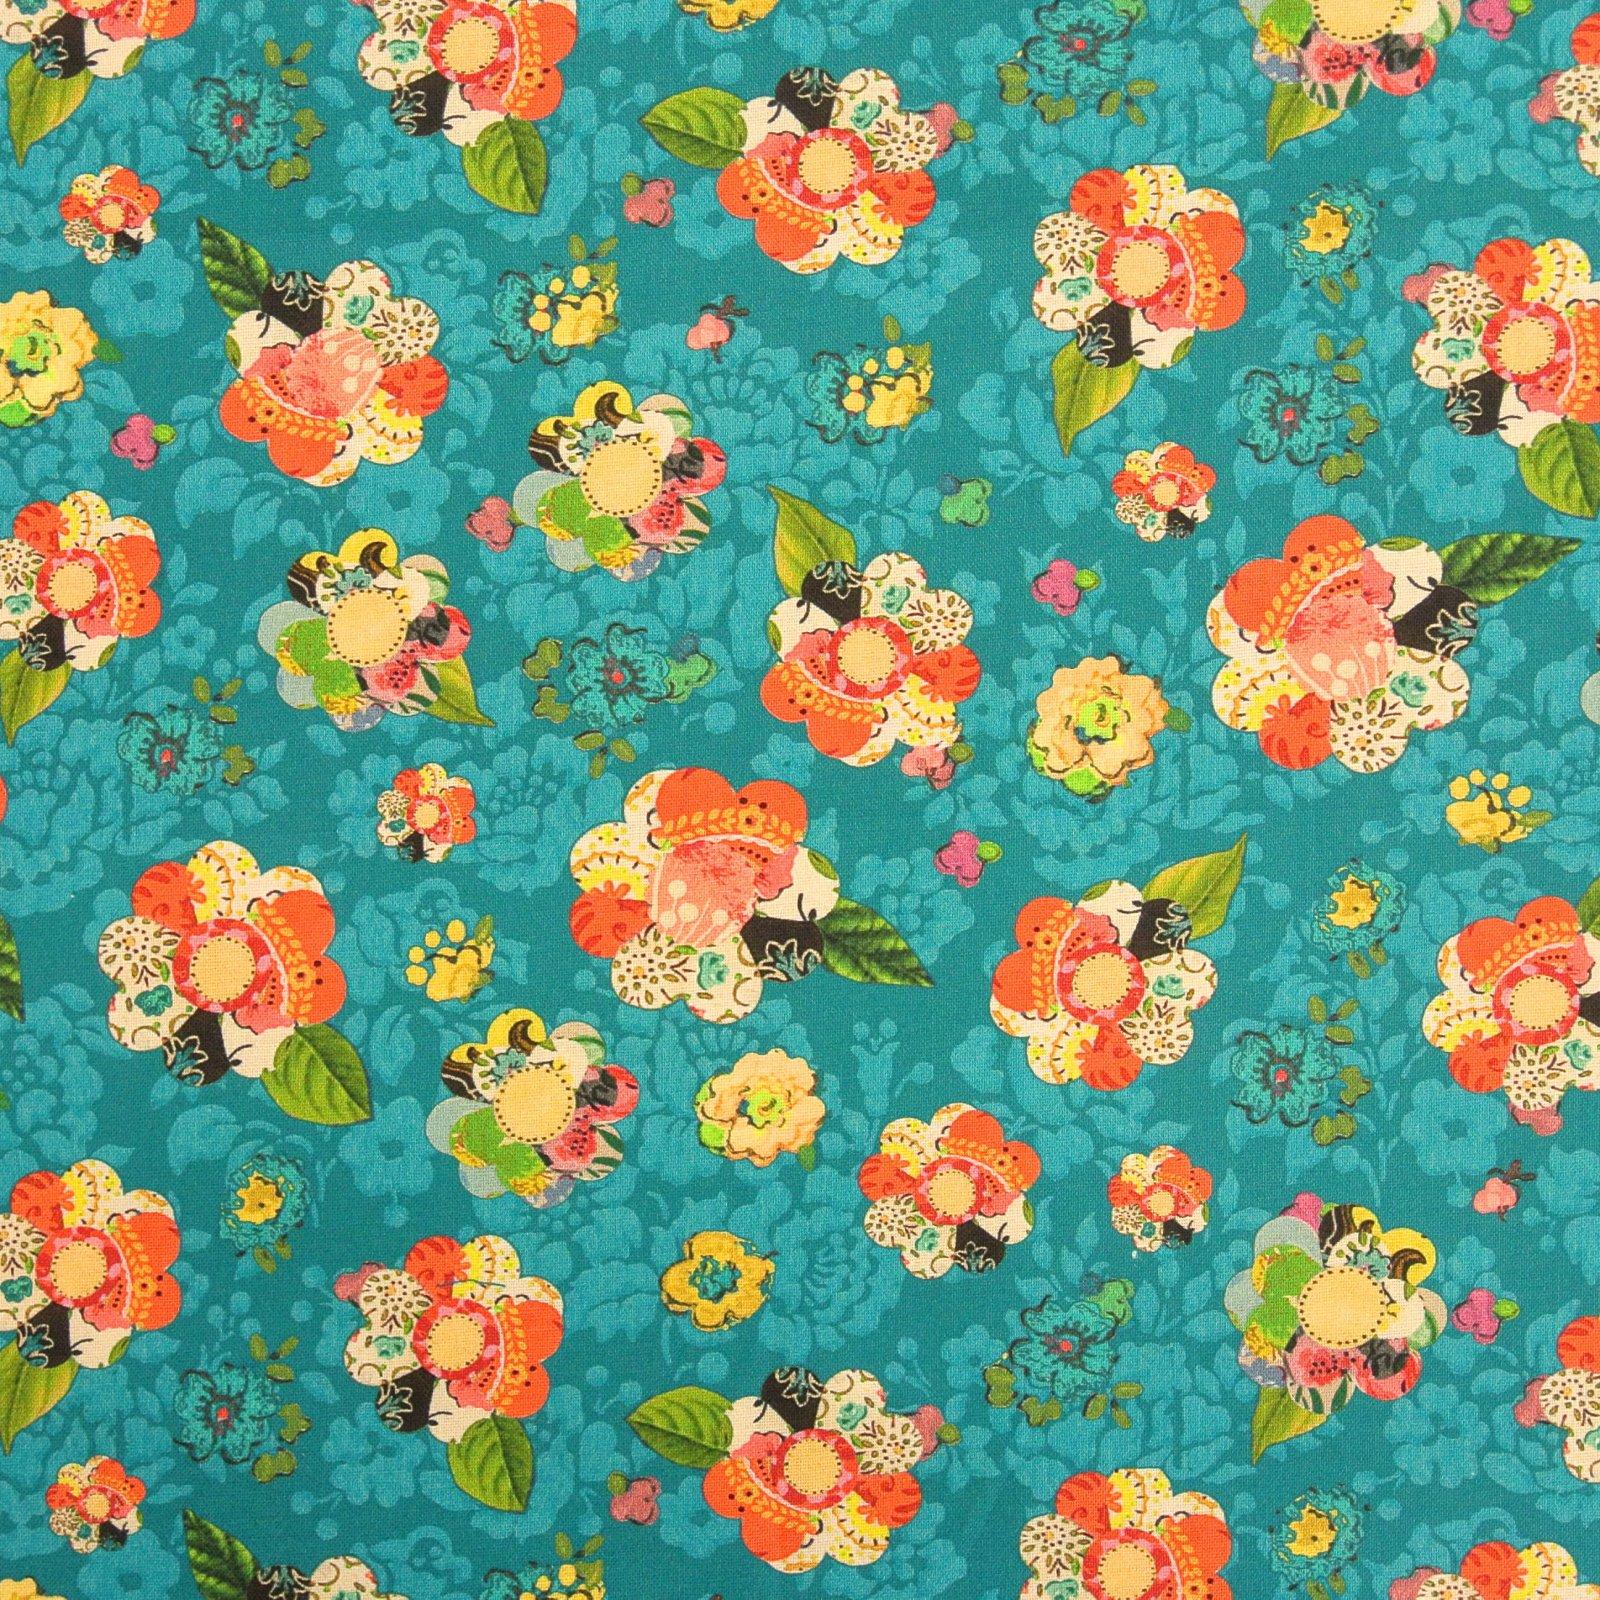 Collage Flower dk teal Soul Shine & Daydreams